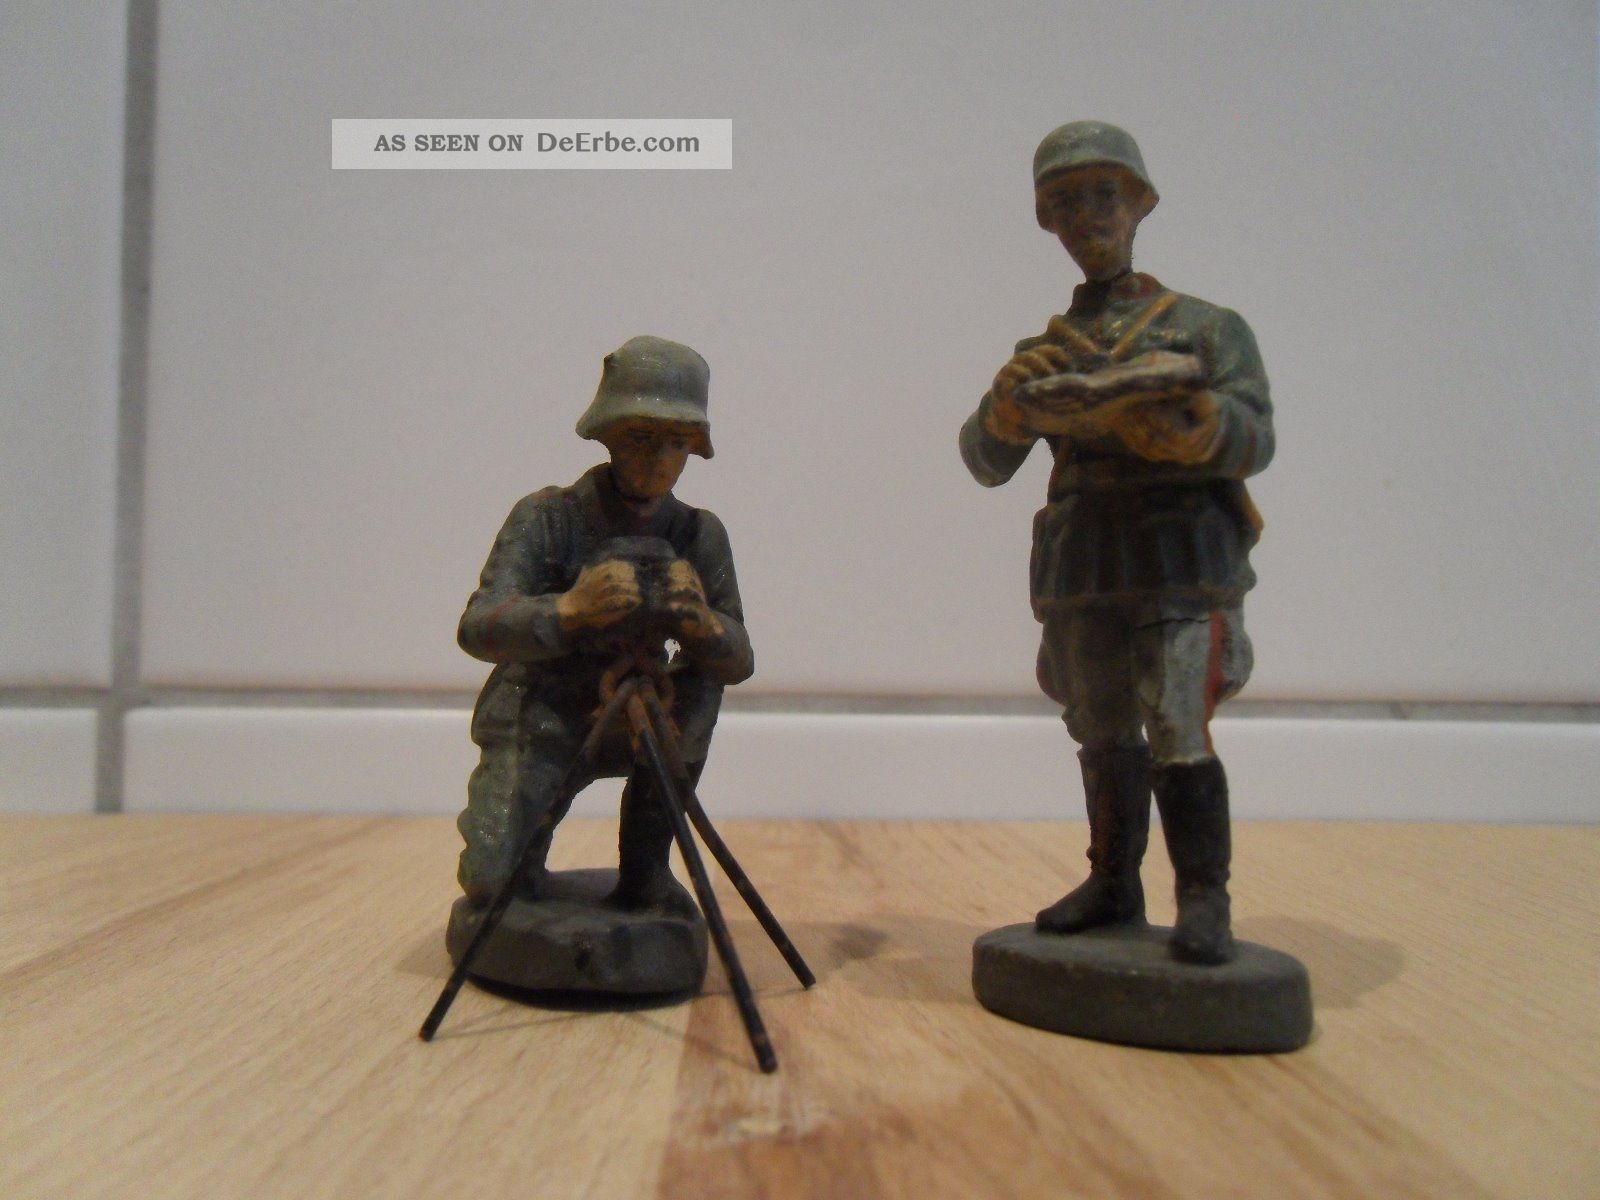 Elastolin soldaten im feld kartenleser entfernungsmesser